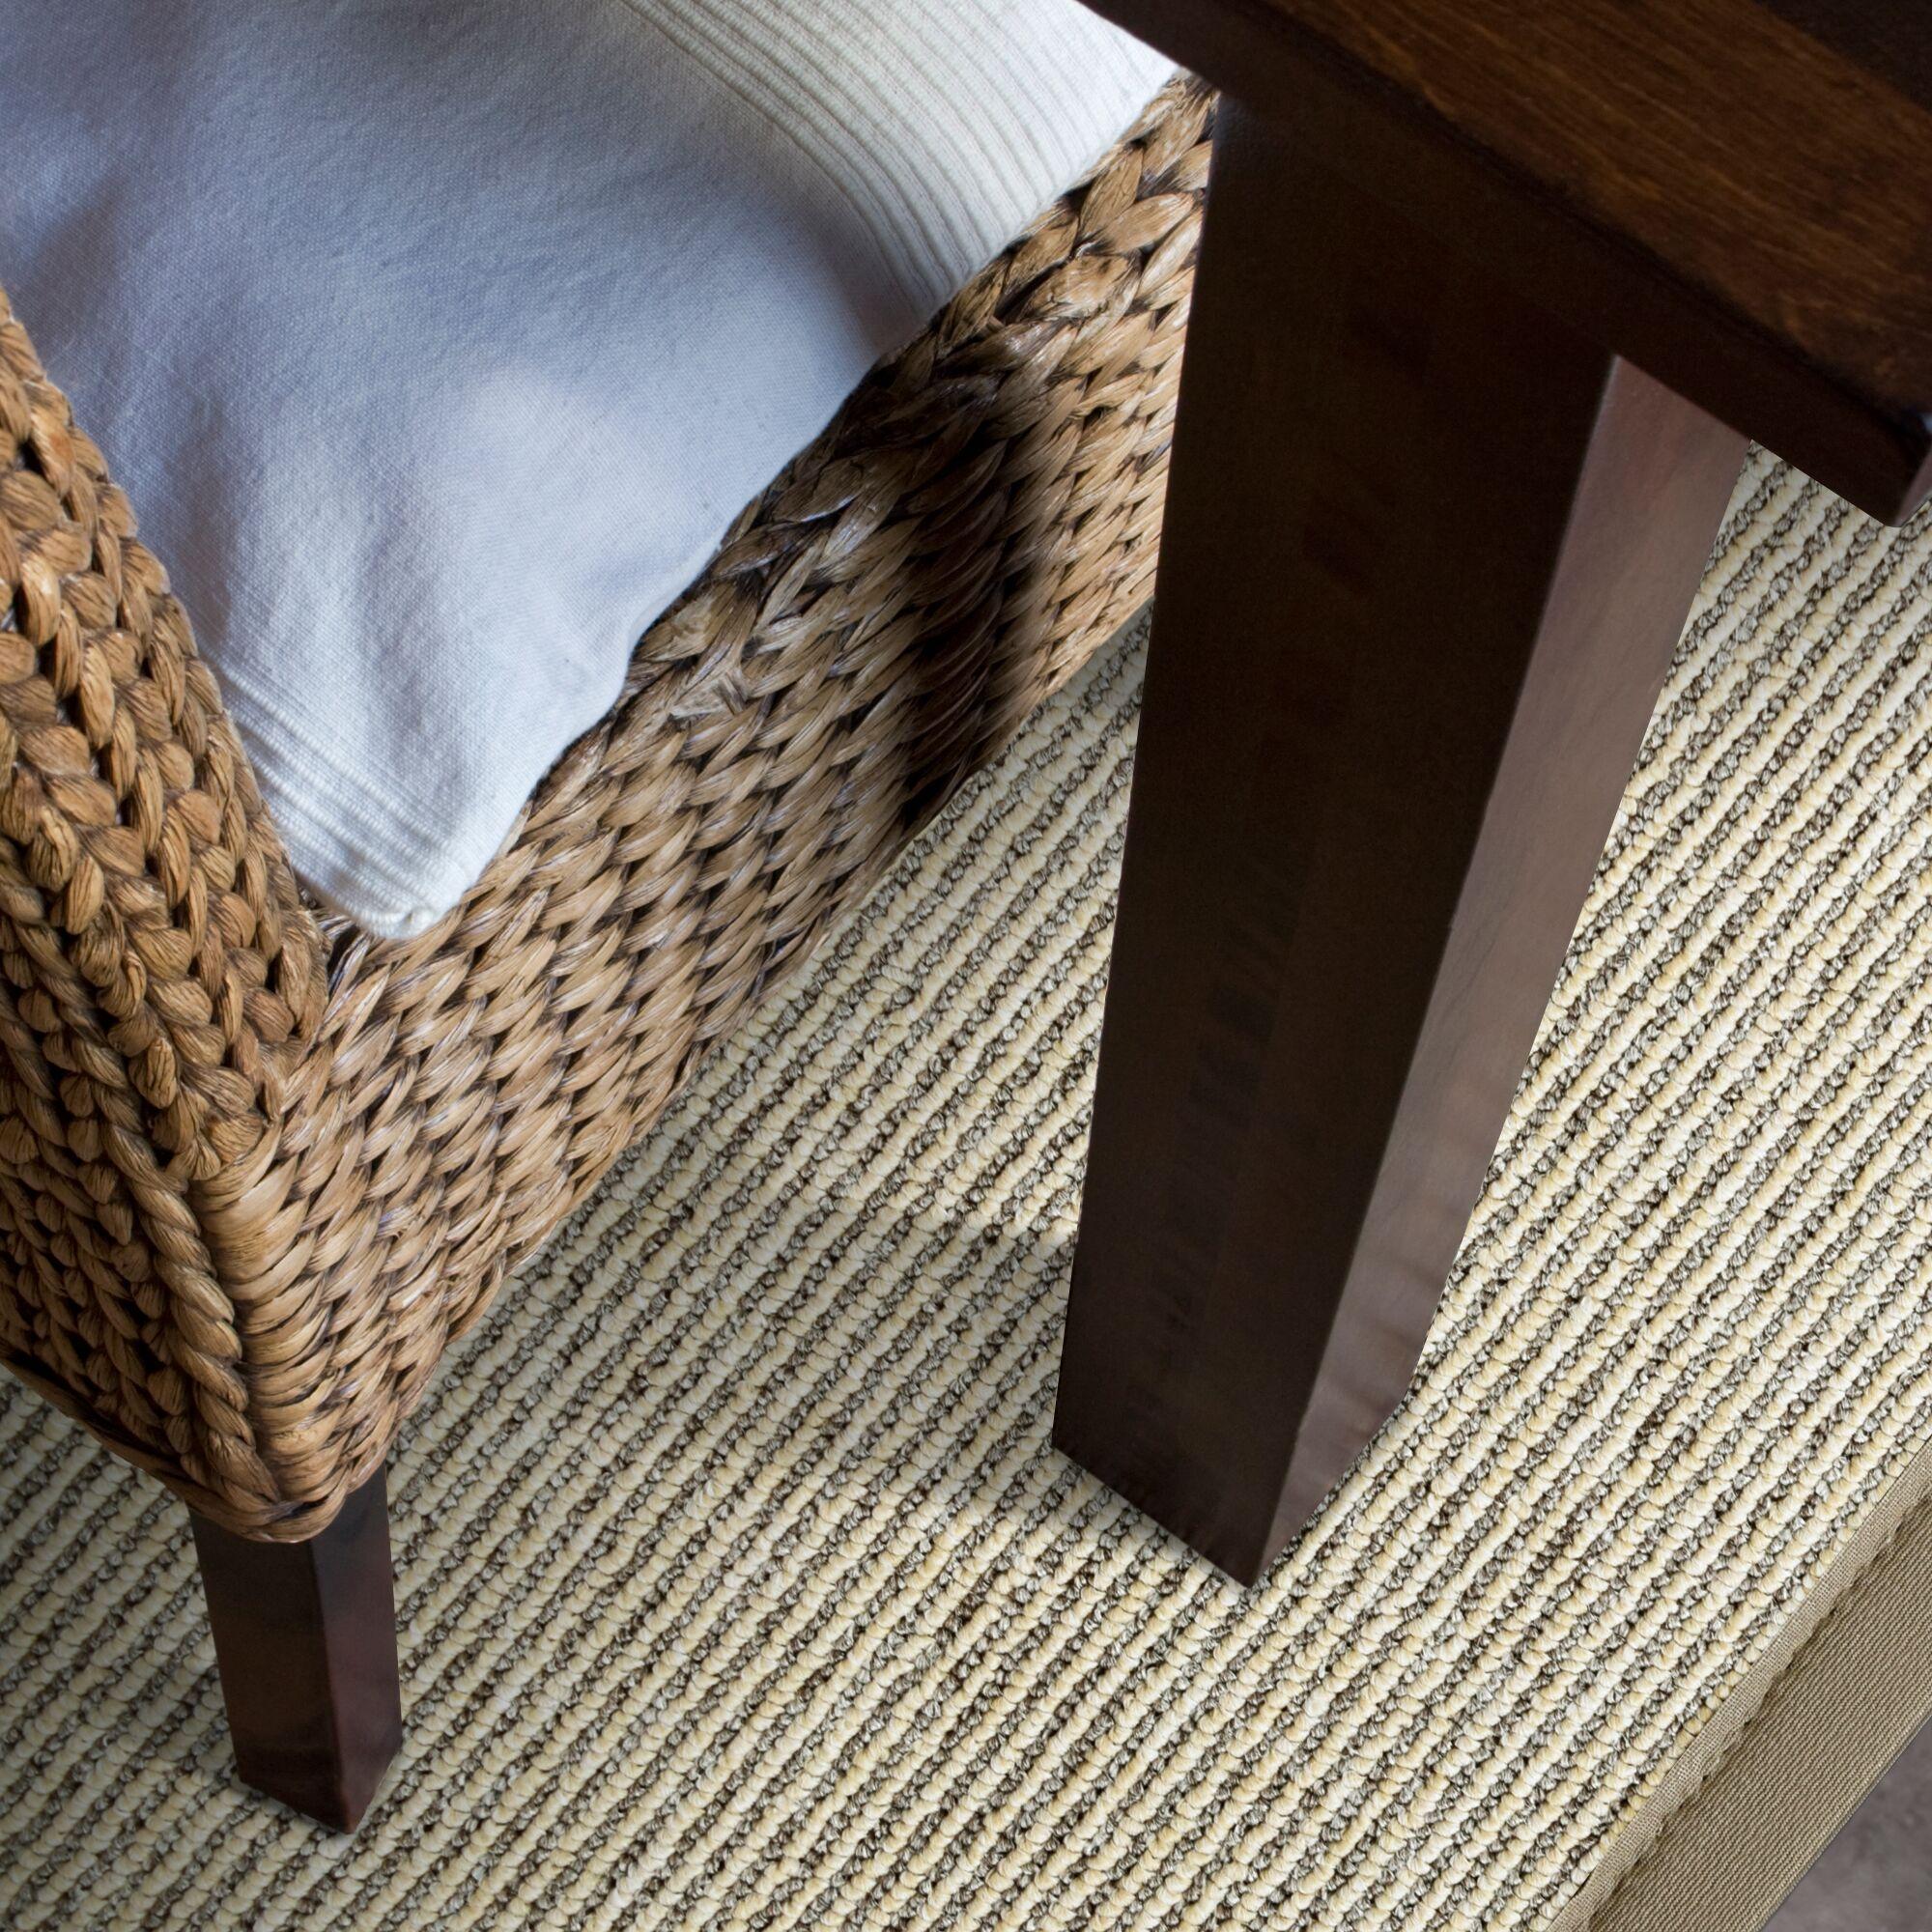 Marica Synthetic Sisal Beige Area Rug Rug Size: Runner 2' x 8'